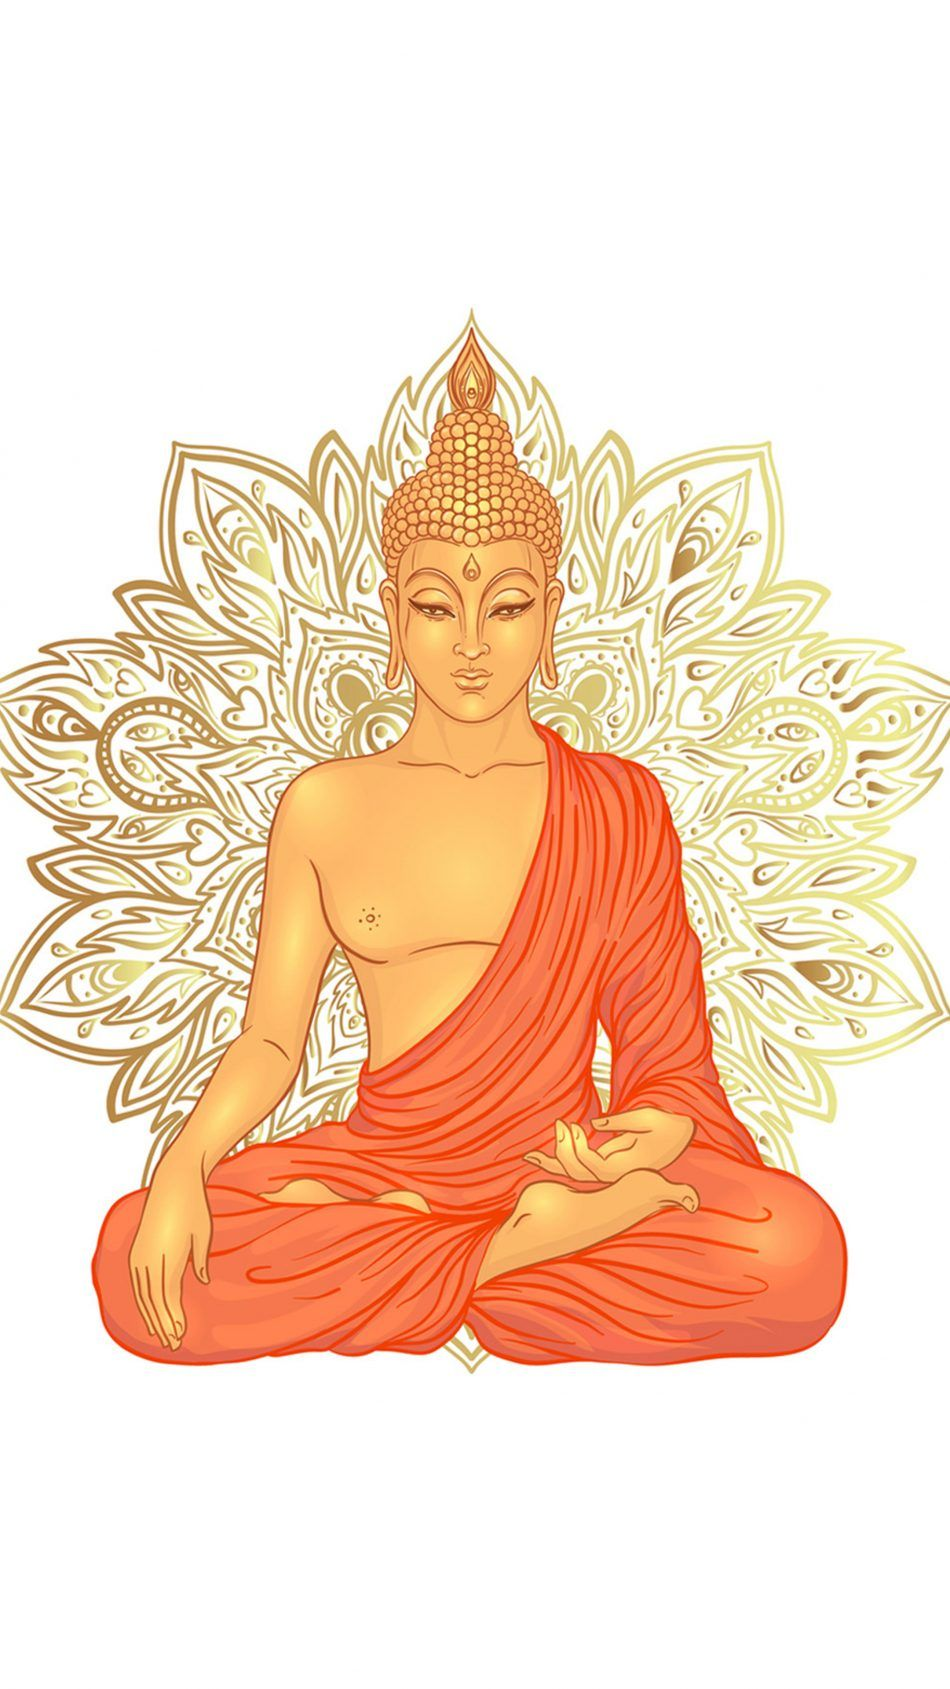 Lord Buddha Art Buddha Art Art Buddha Wallpaper Iphone